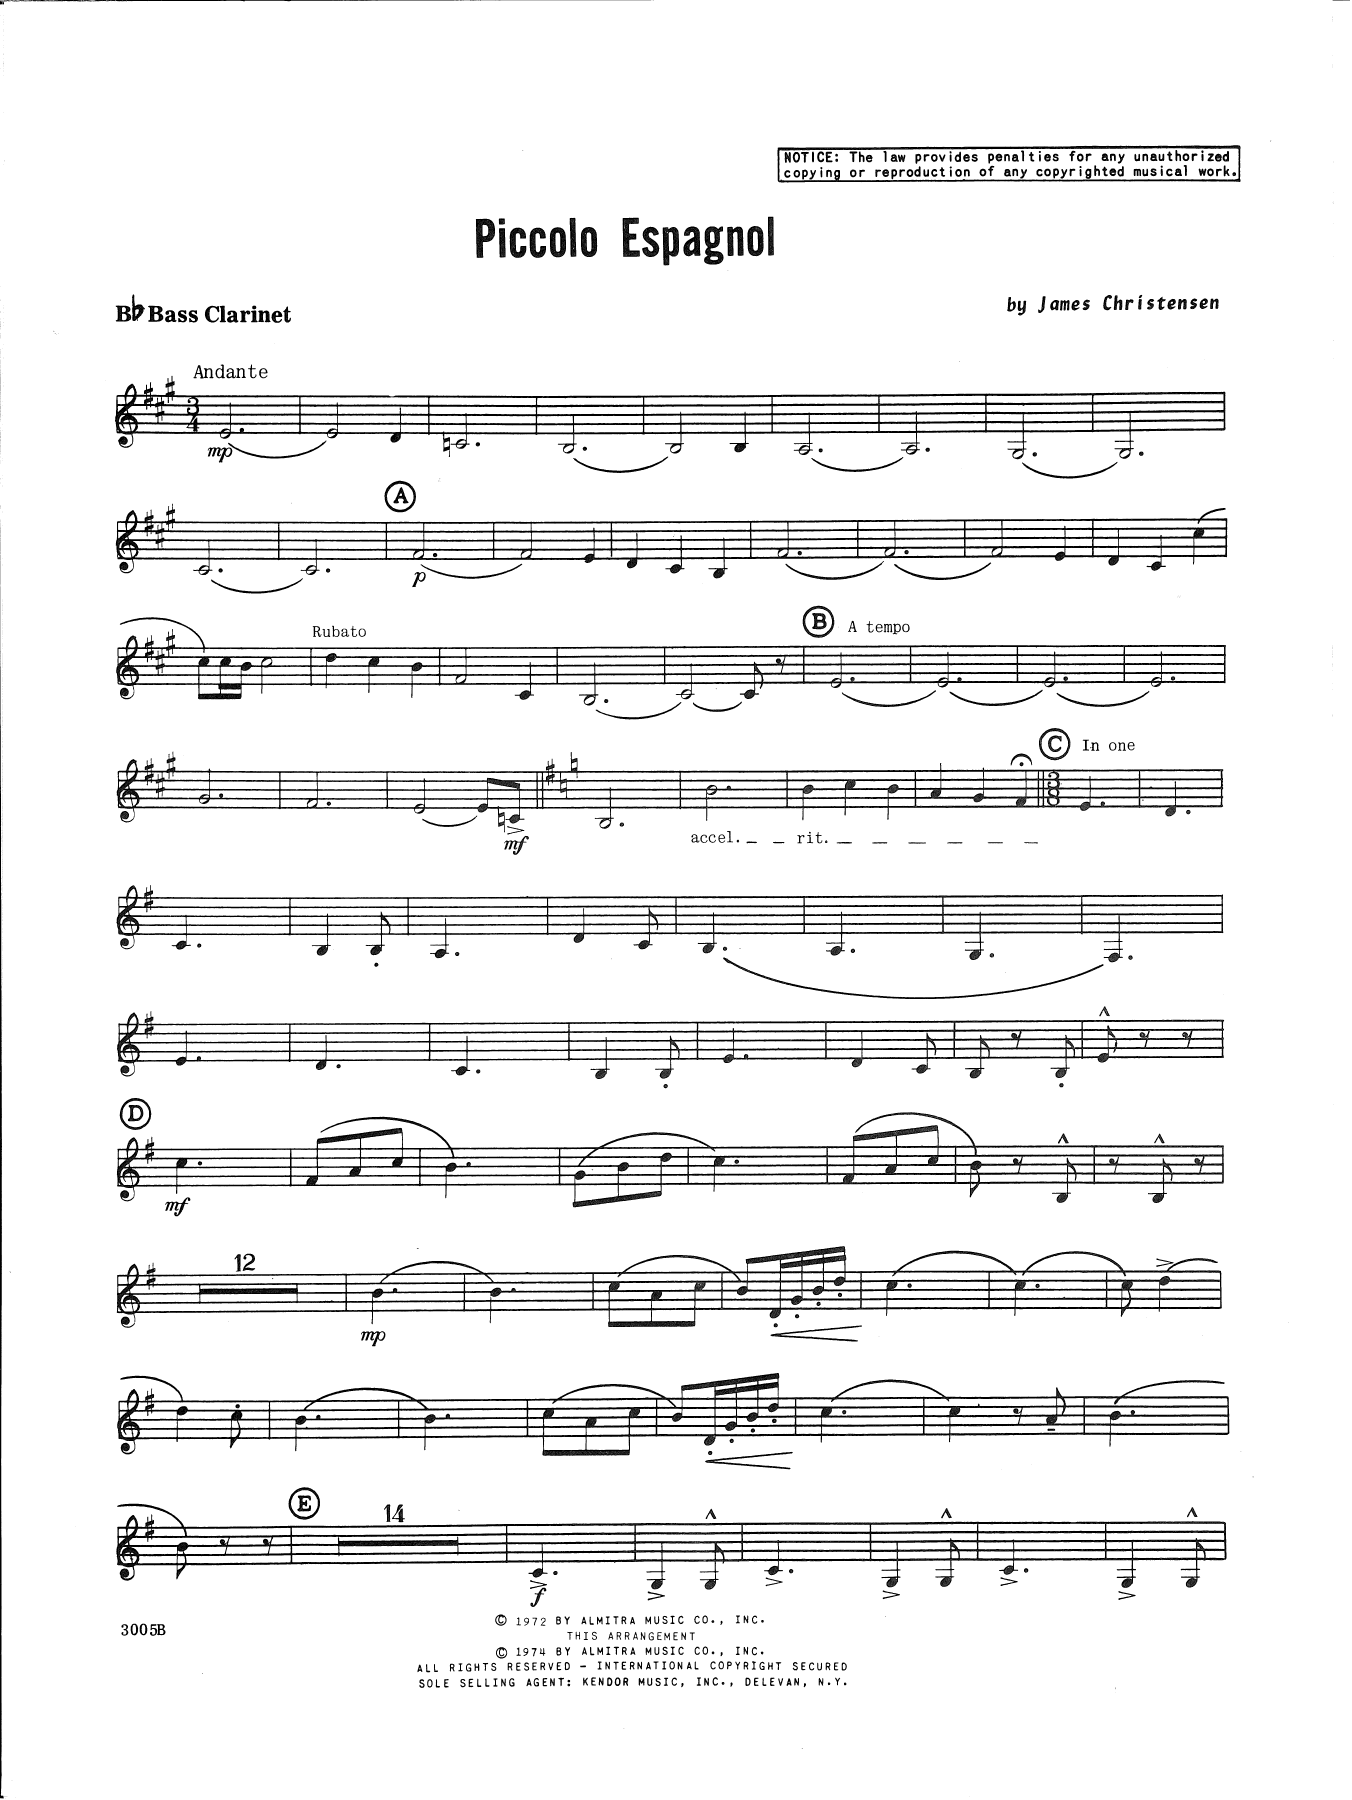 James Christensen Piccolo Espagnol - Bb Bass Clarinet sheet music notes and chords. Download Printable PDF.